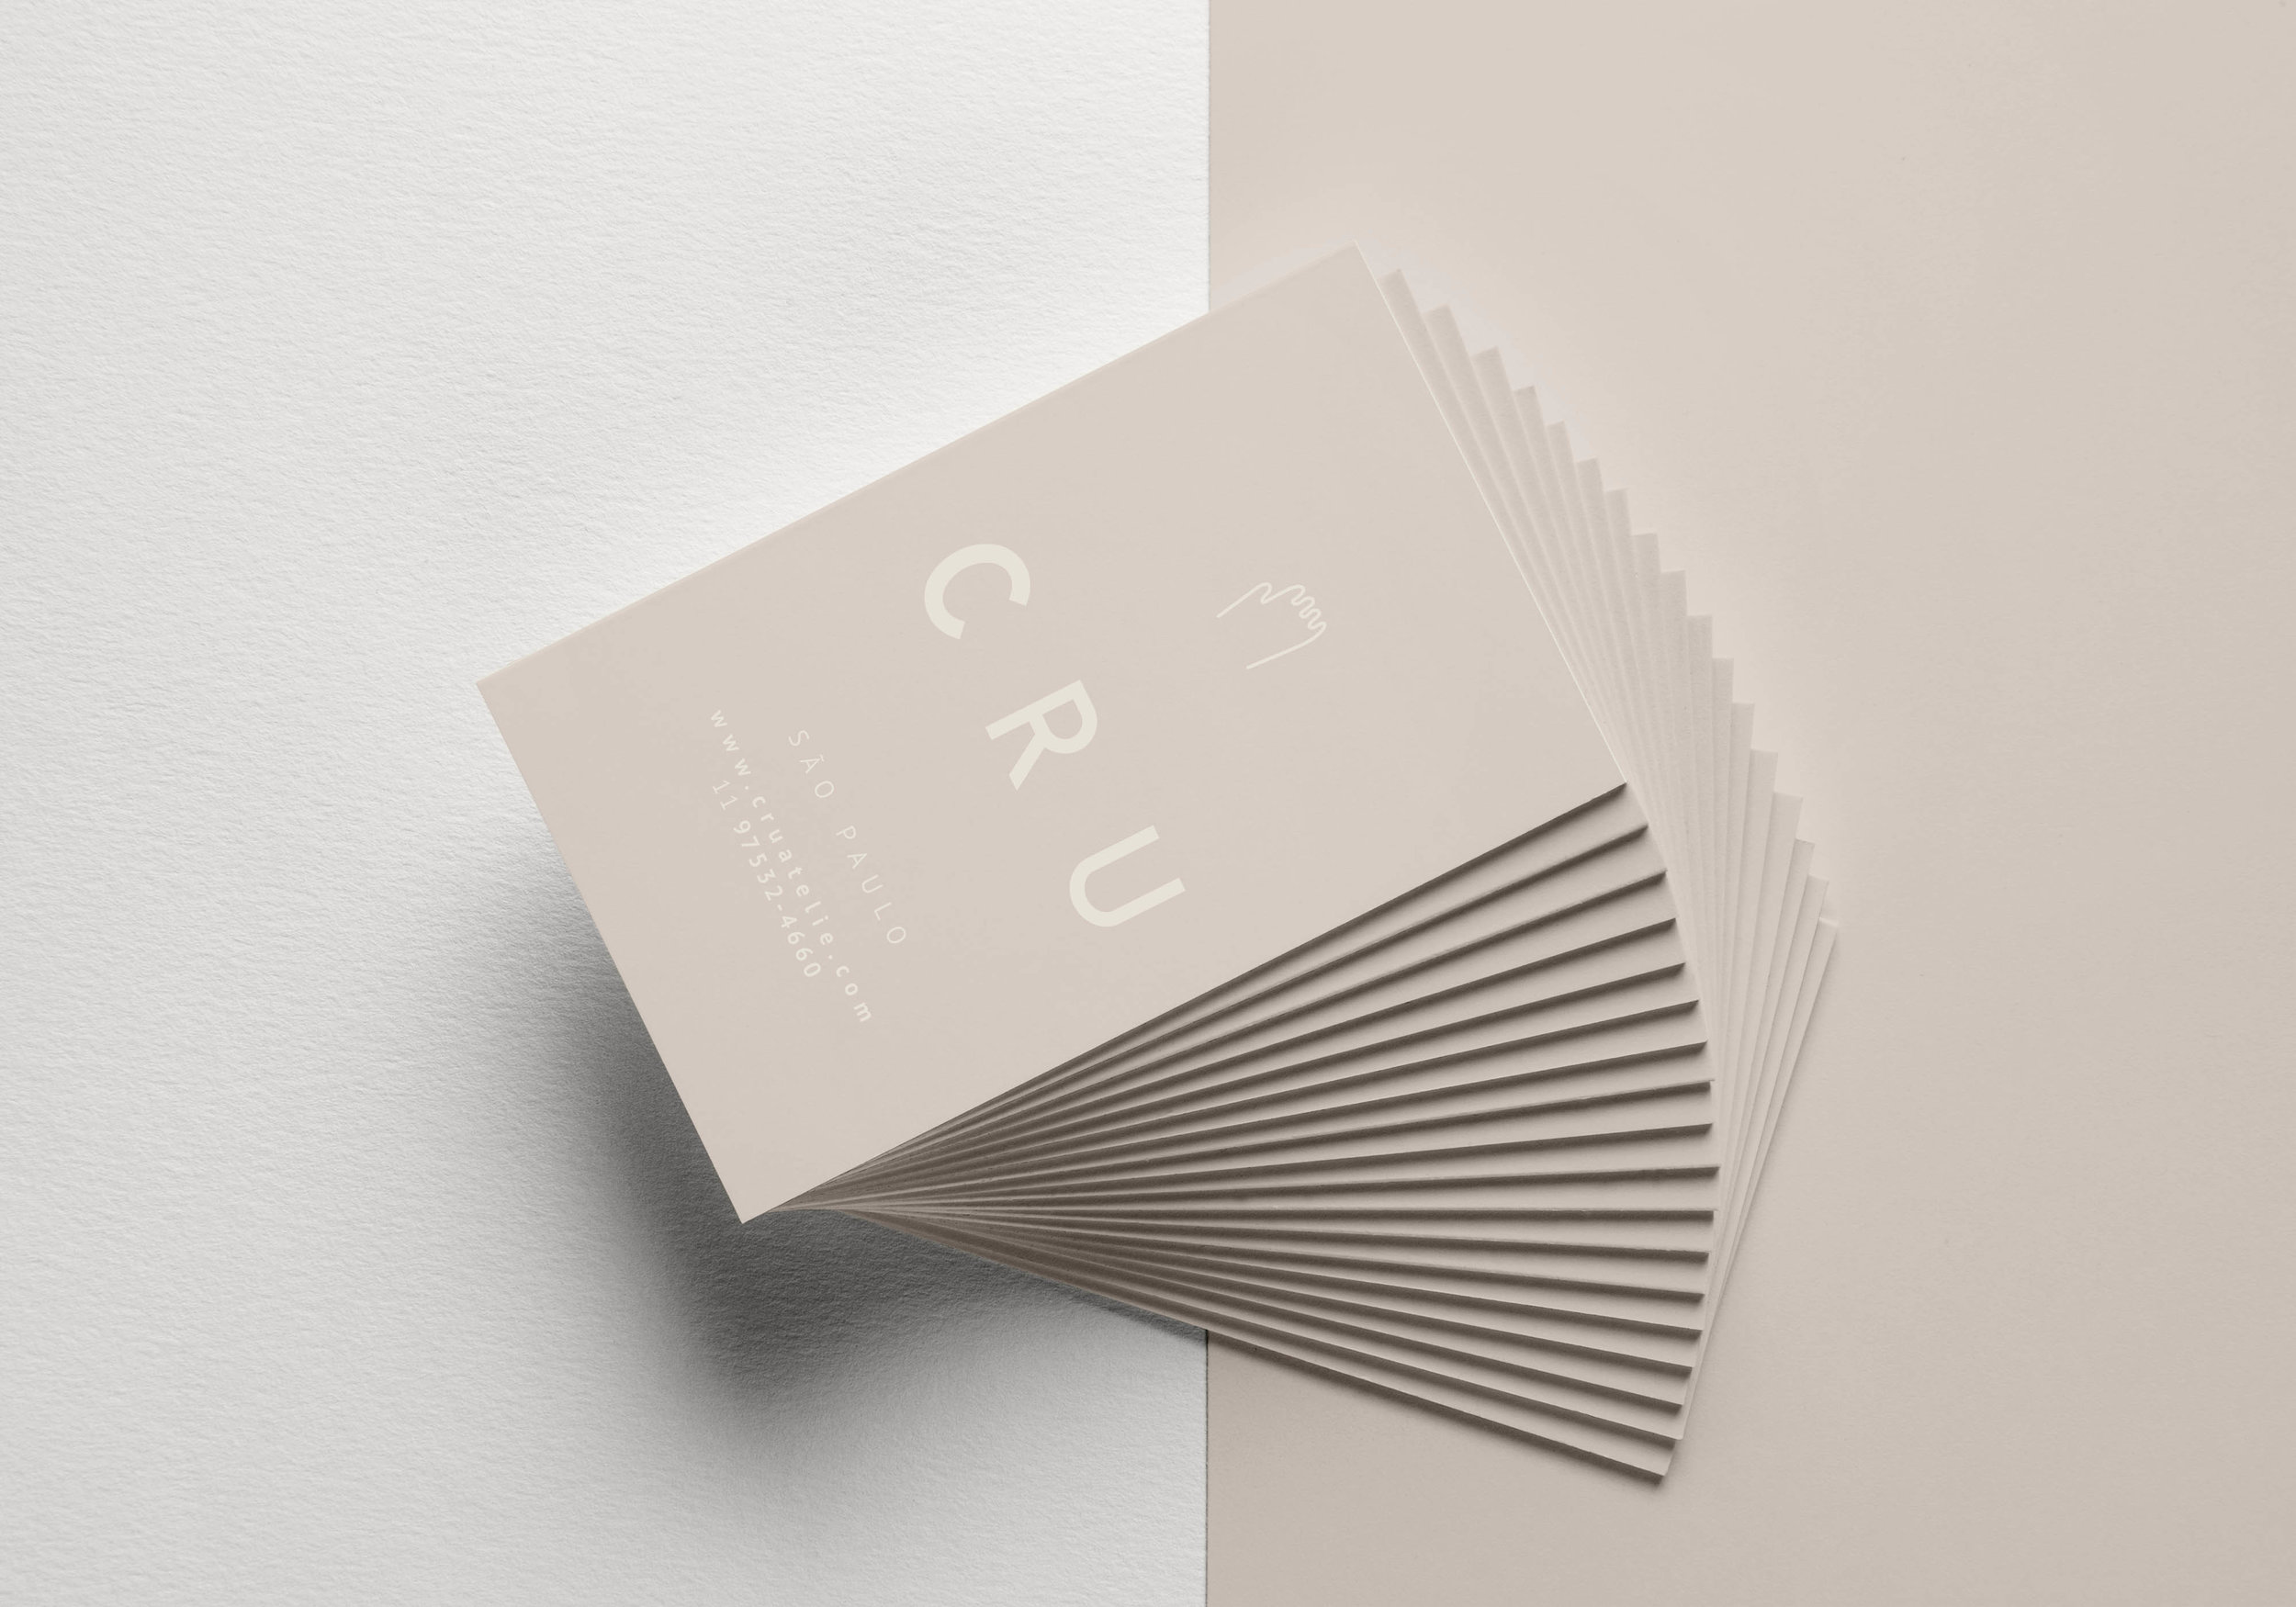 Realistic Business Cards MockUp 6 cru.jpg